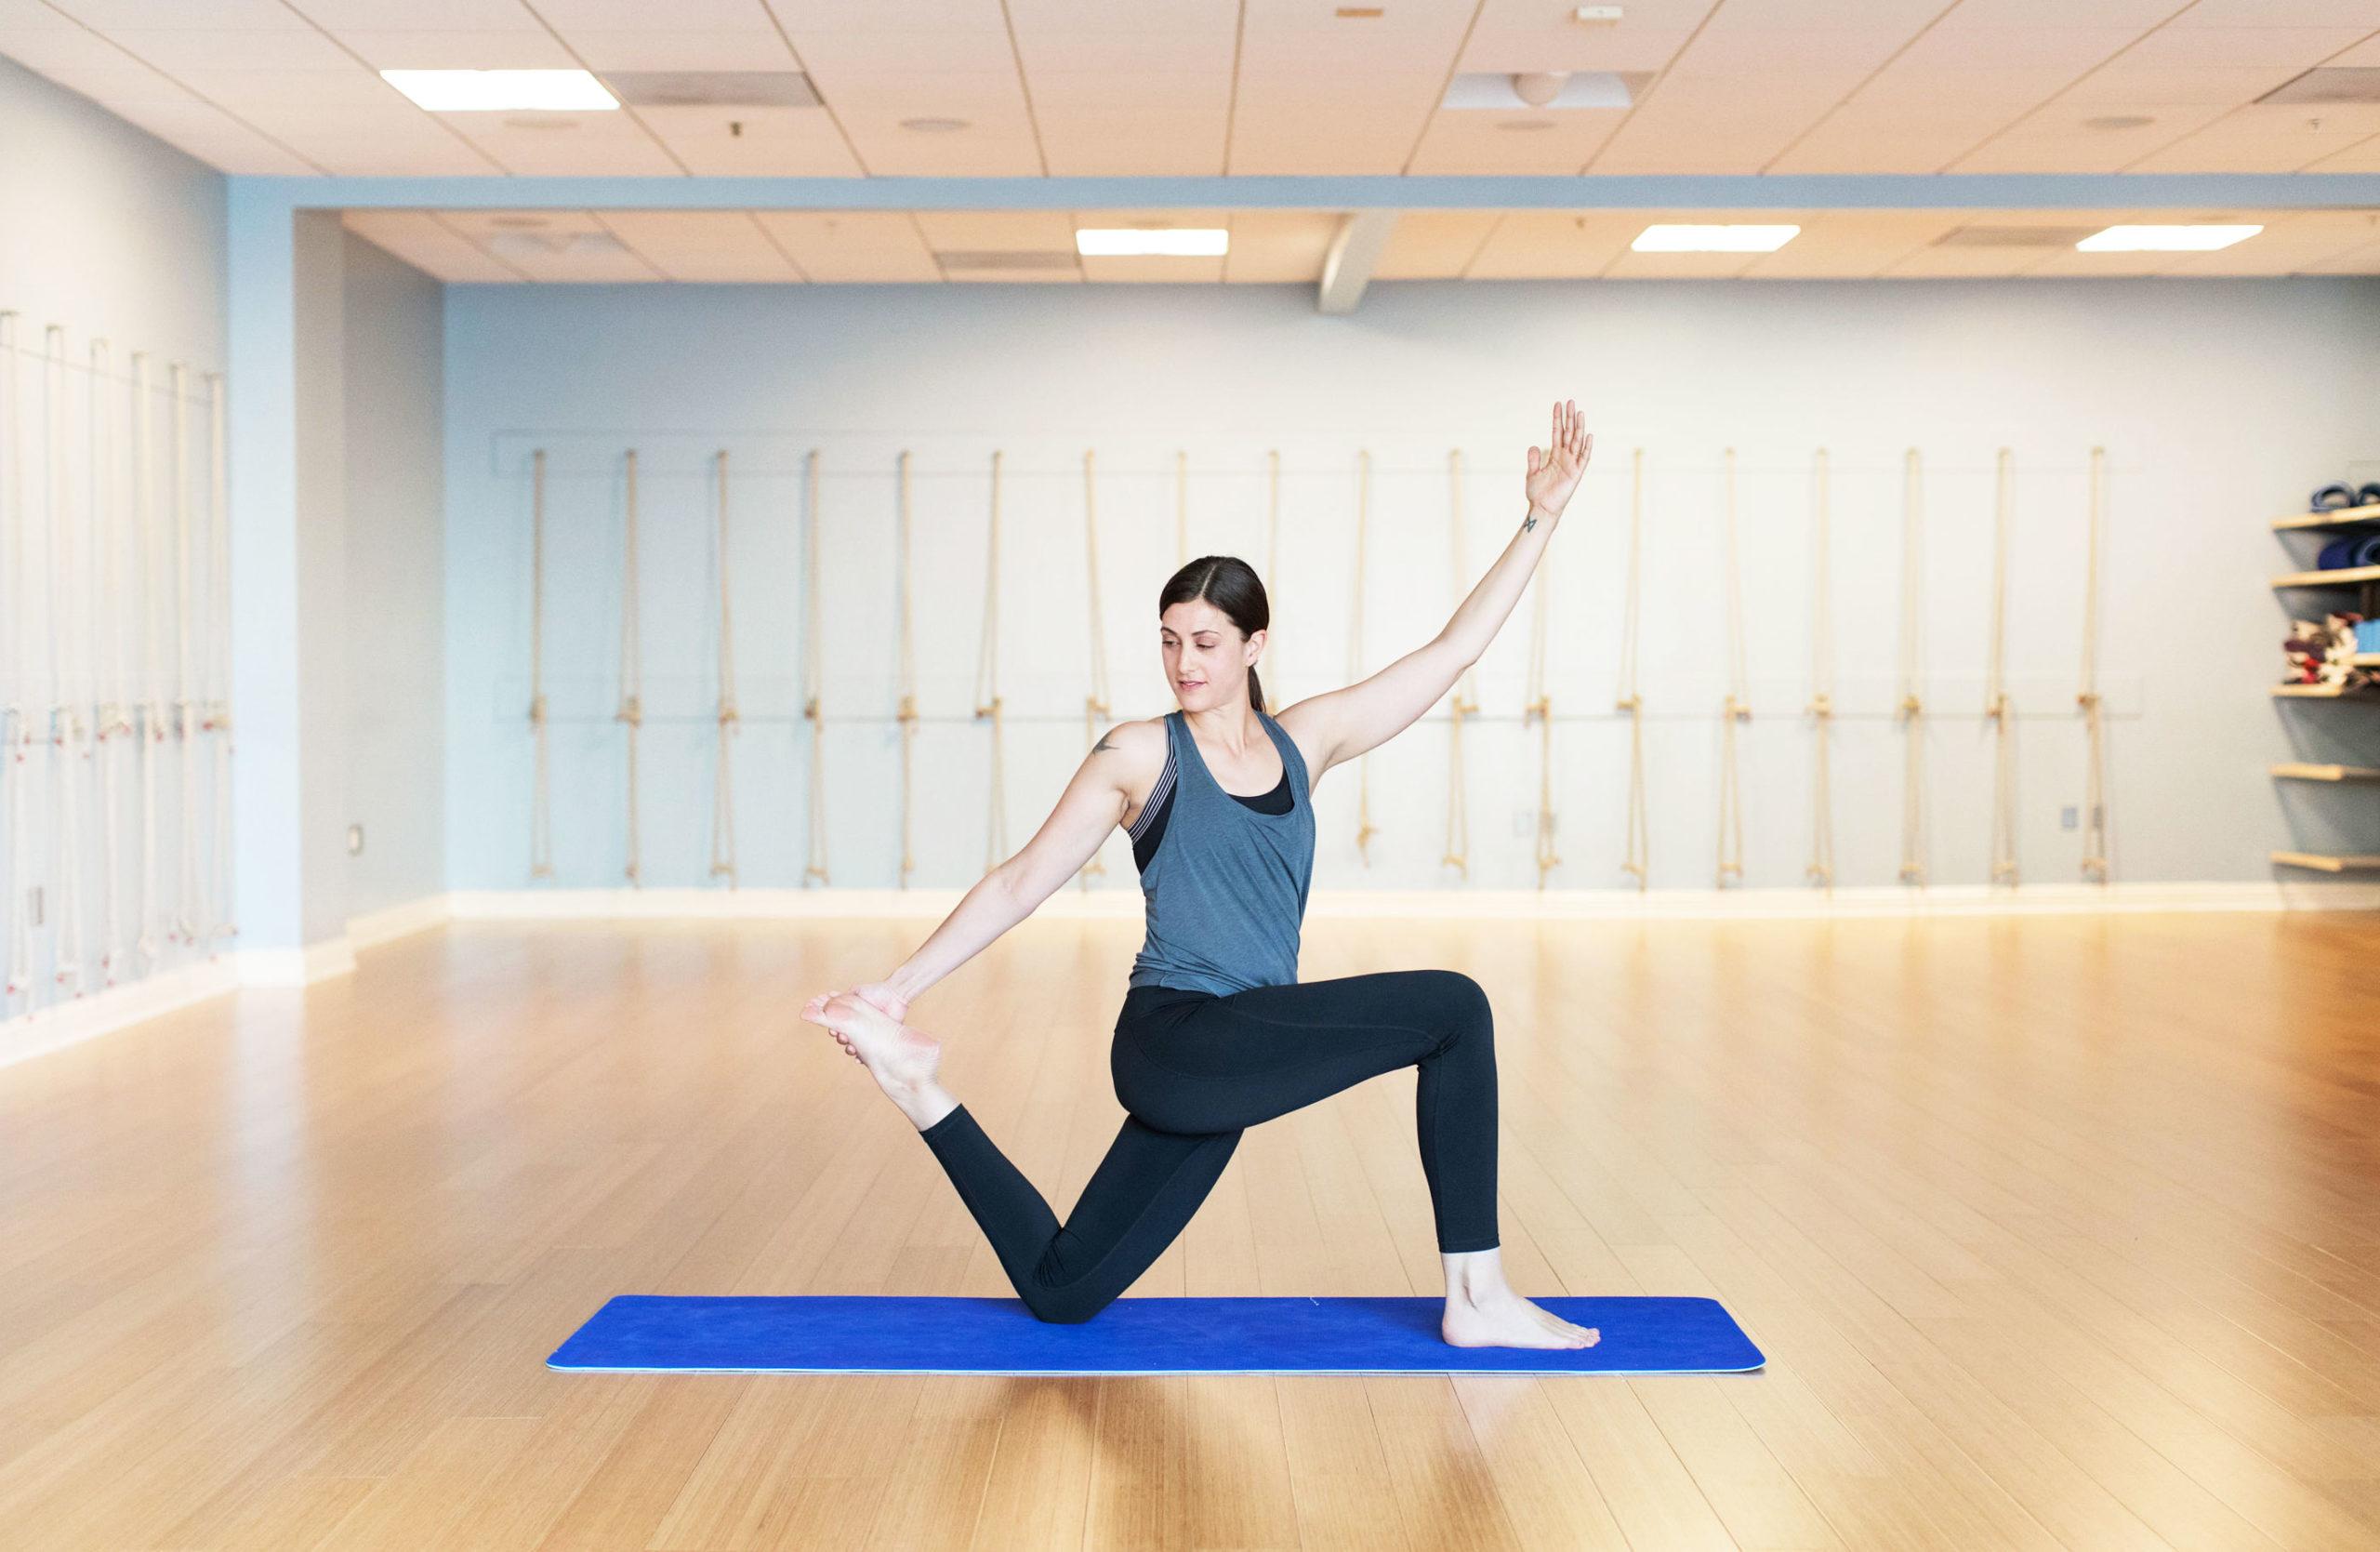 woman stretching on yoga mat